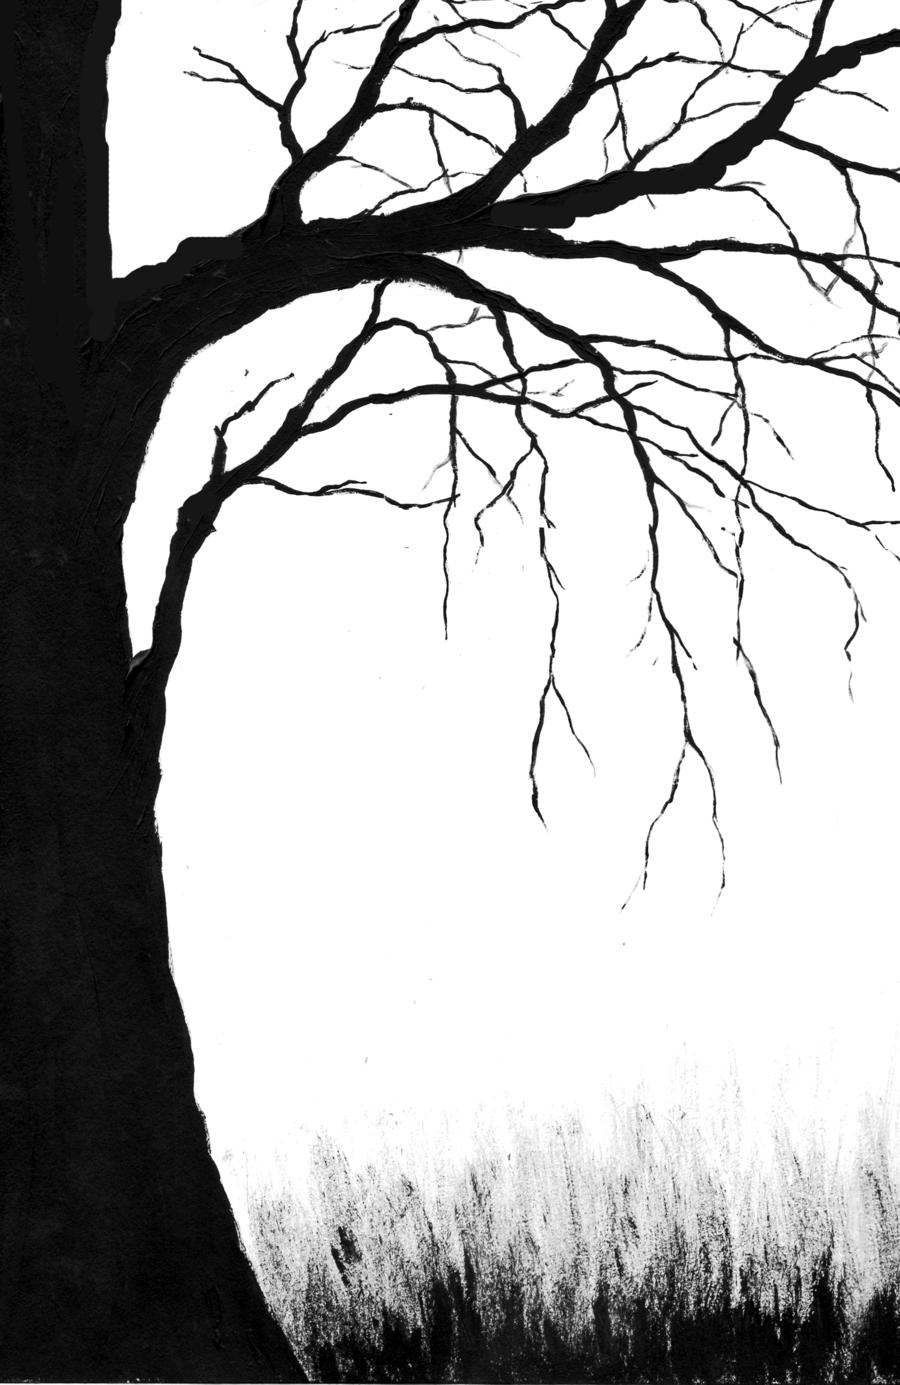 Creepy tree silhouette for Creepy trees for halloween